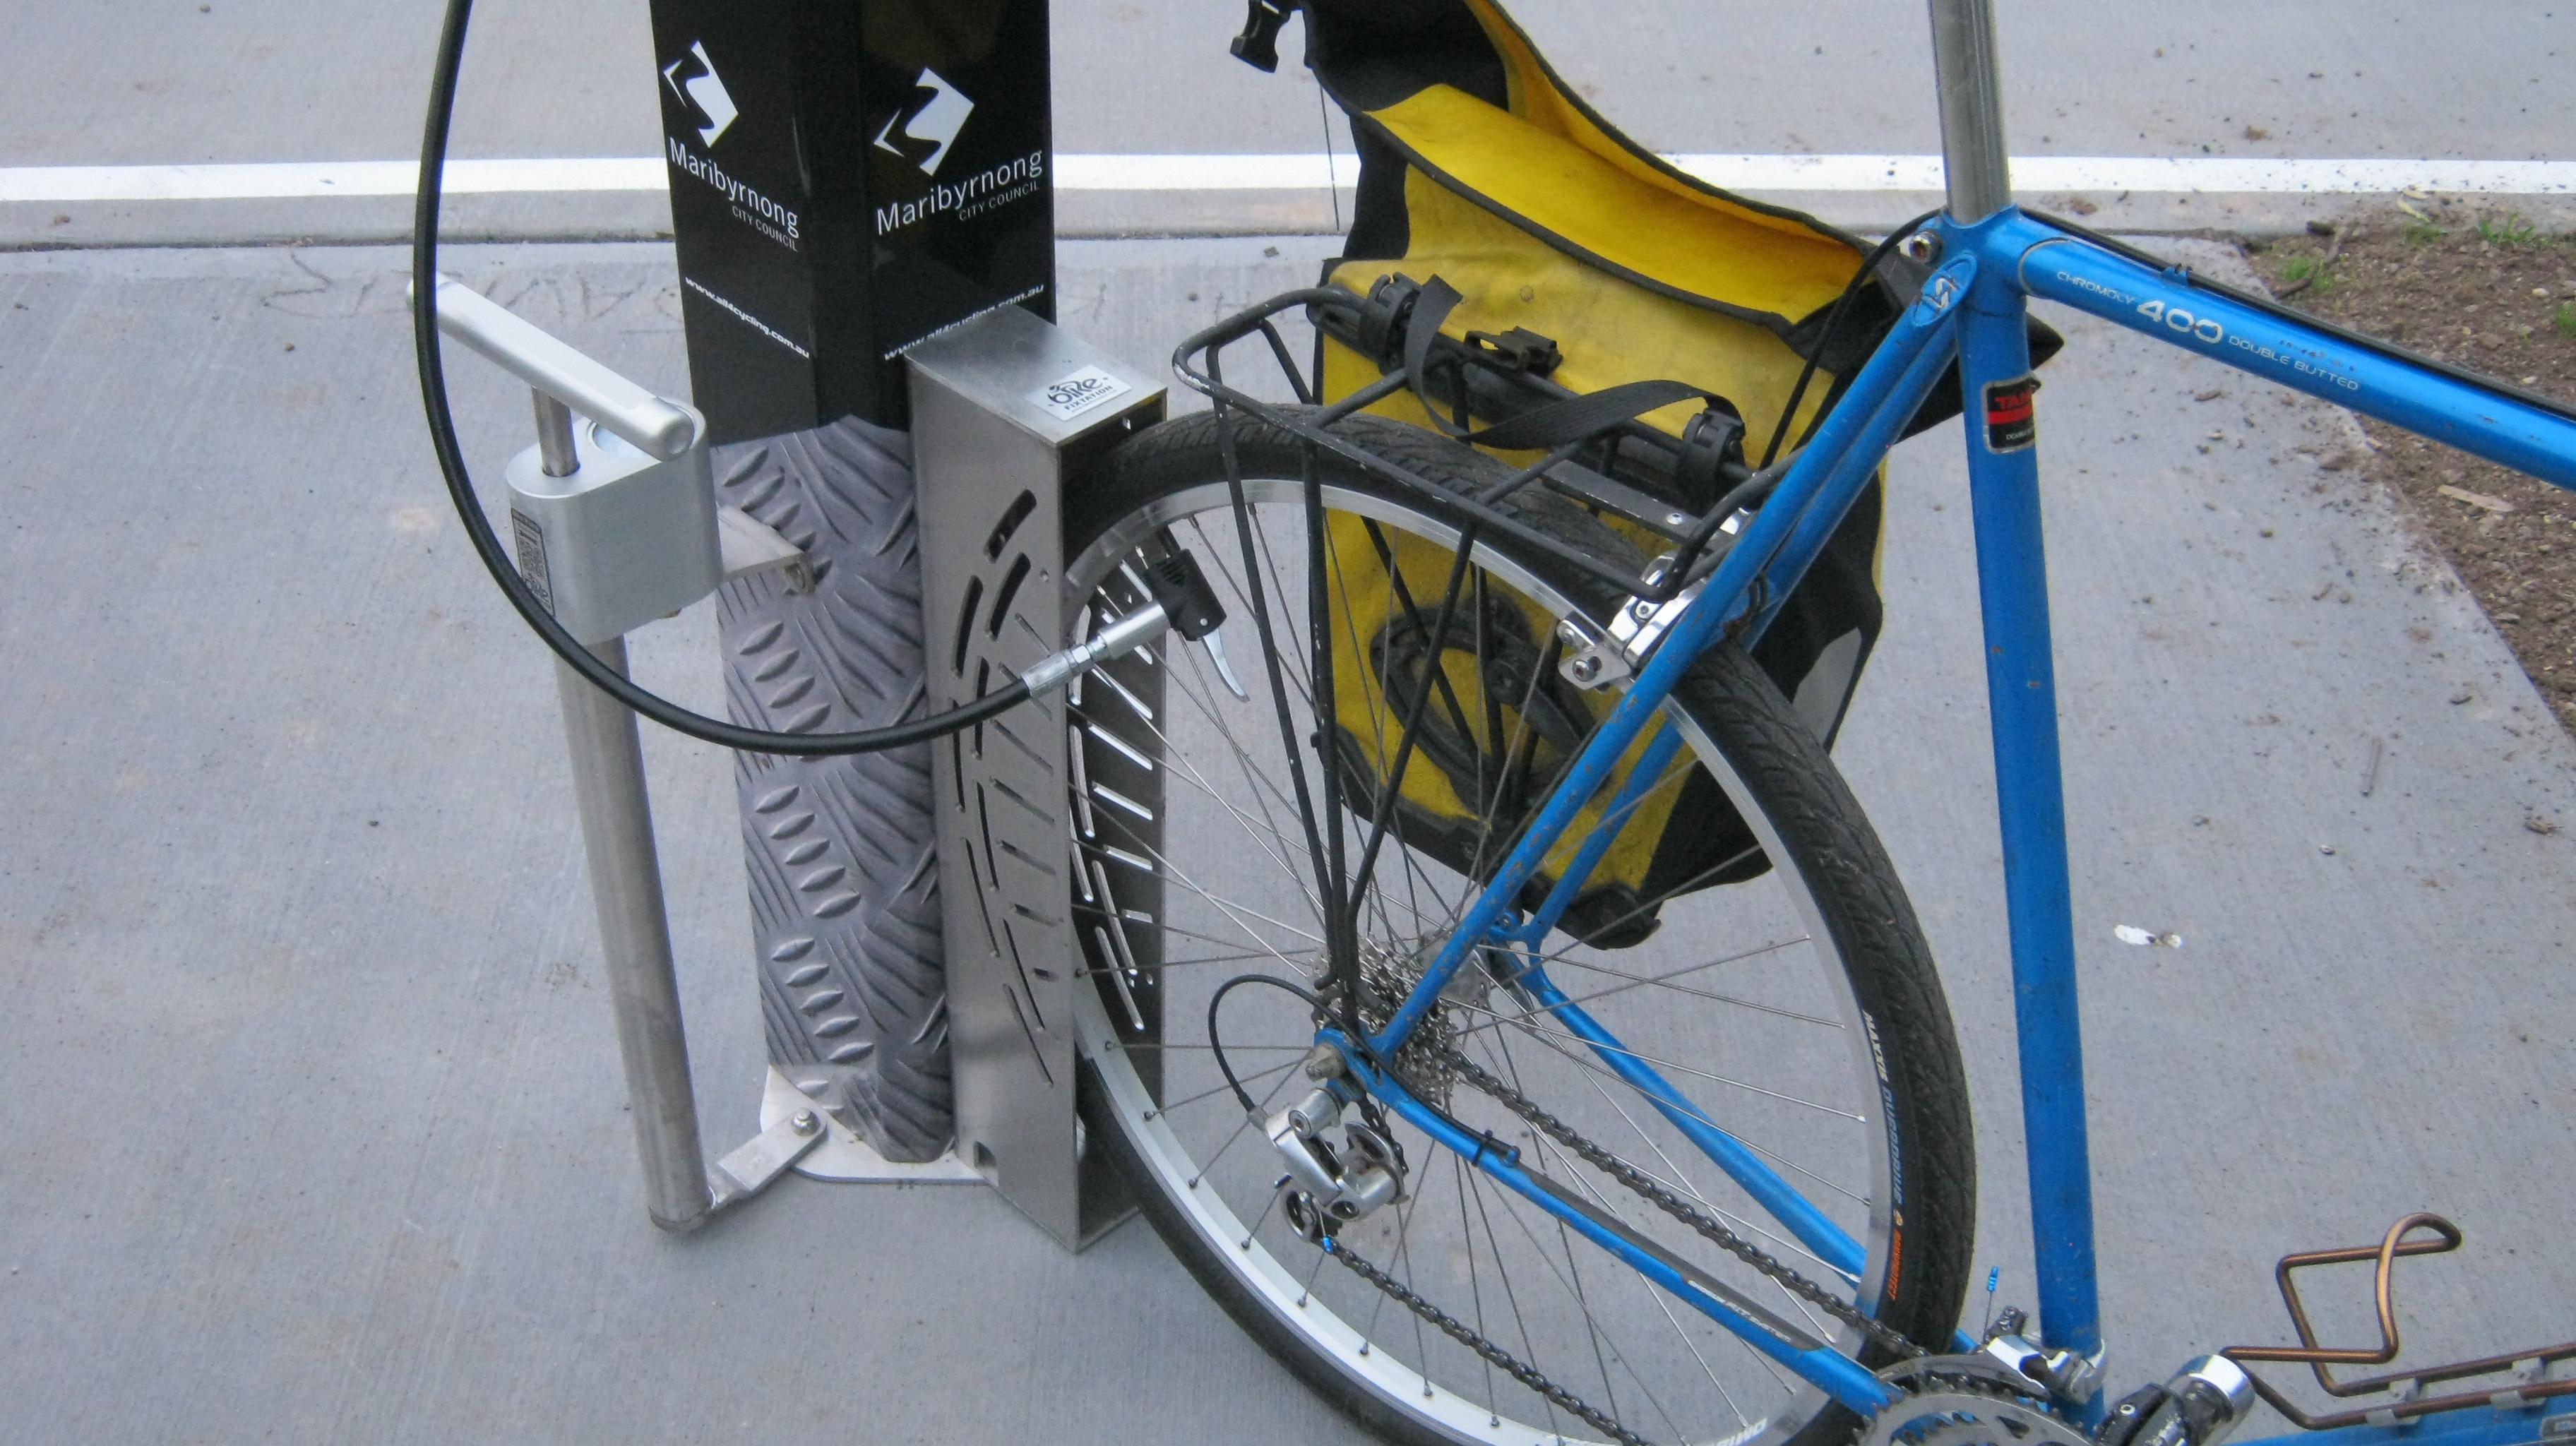 cyclesaloon – Page 2 – Cycle Saloon